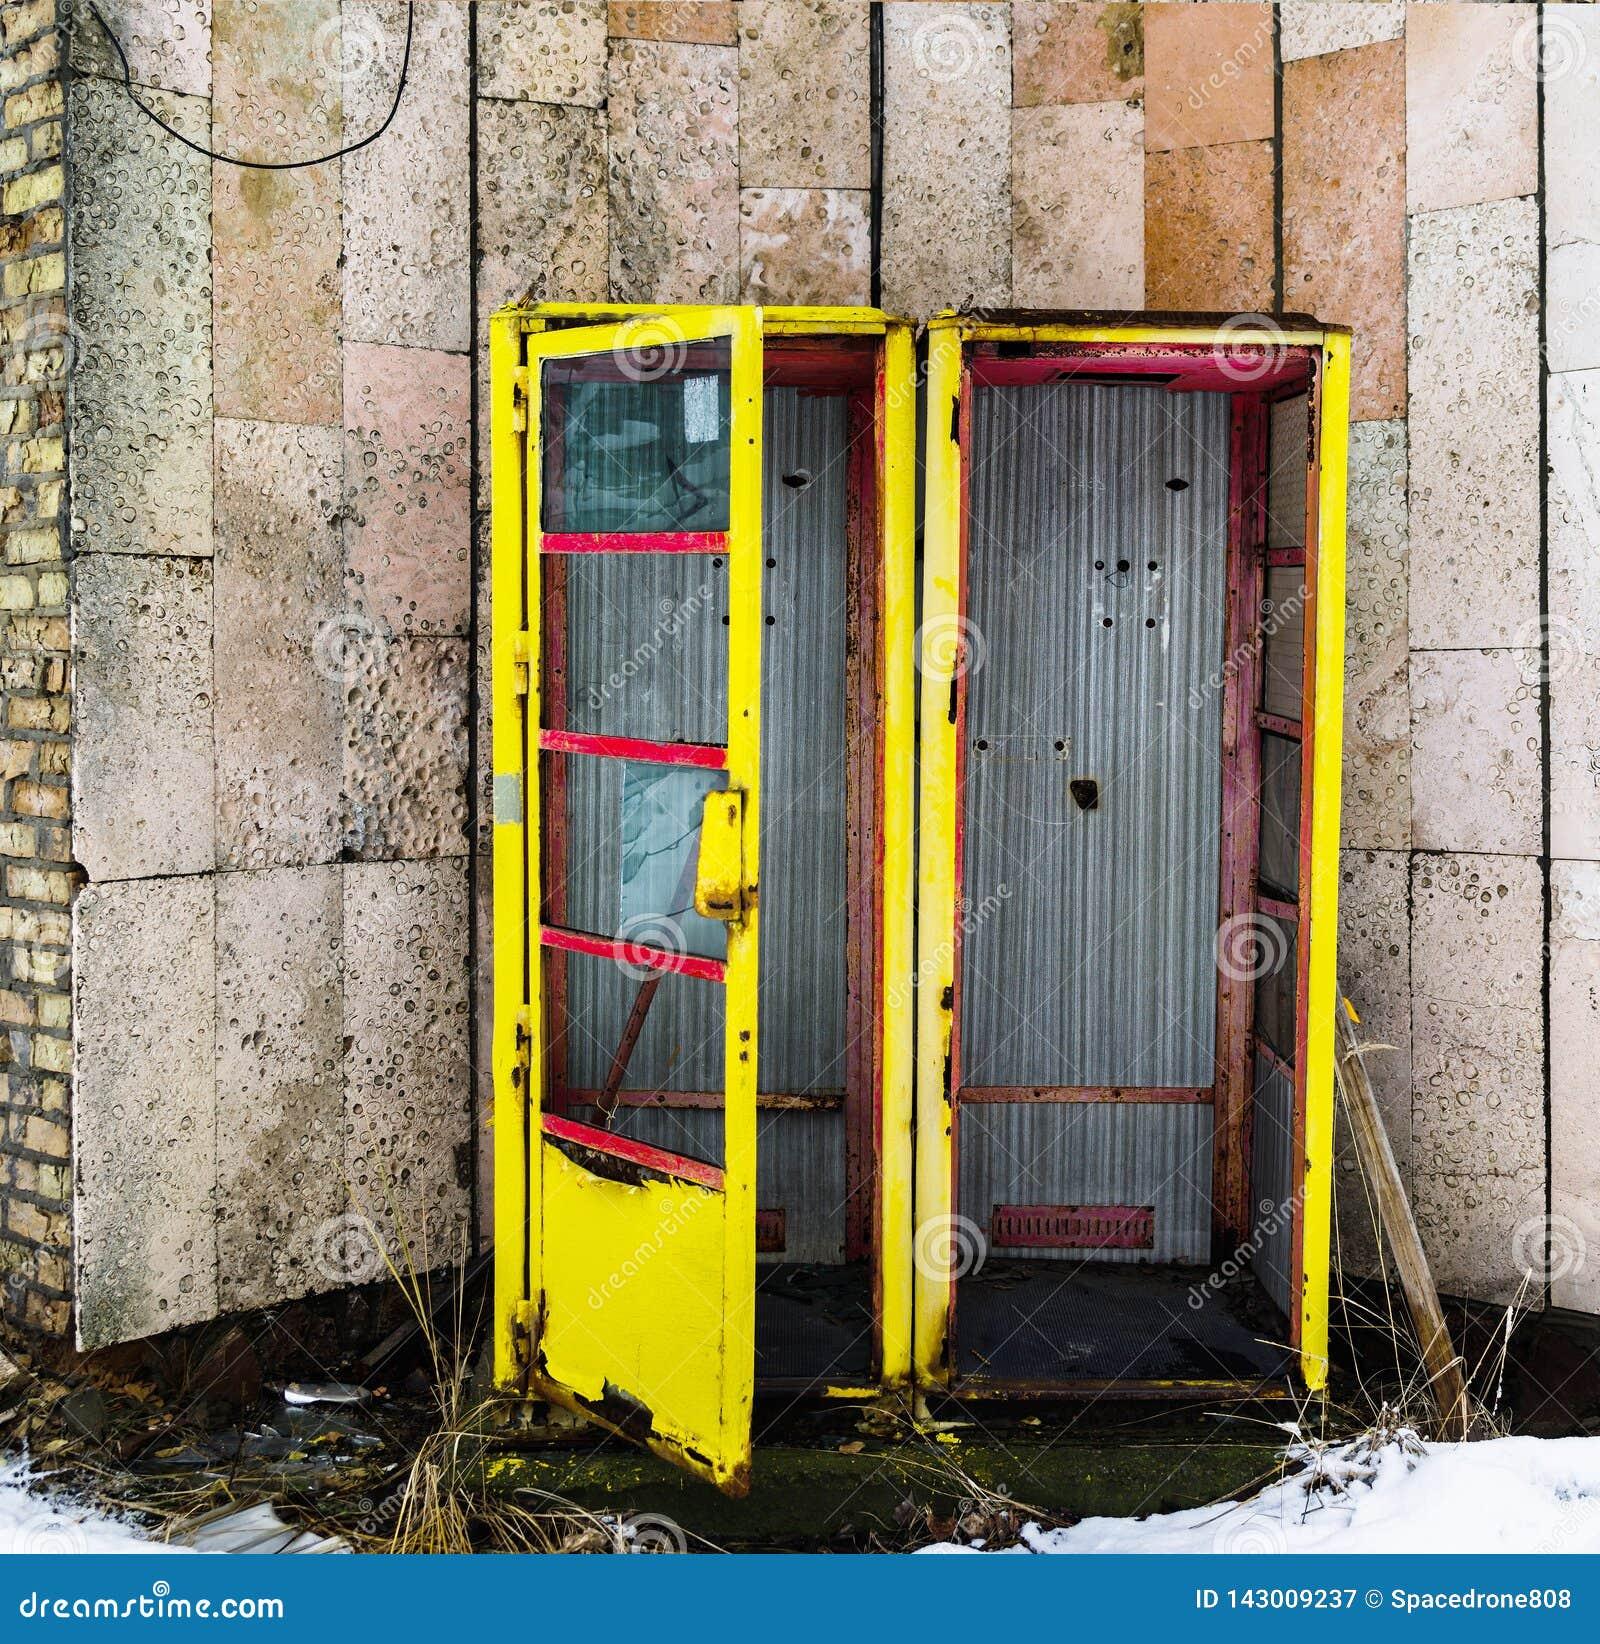 Square Vivid Vintage Radioactive Ussr Pripyat Call-box